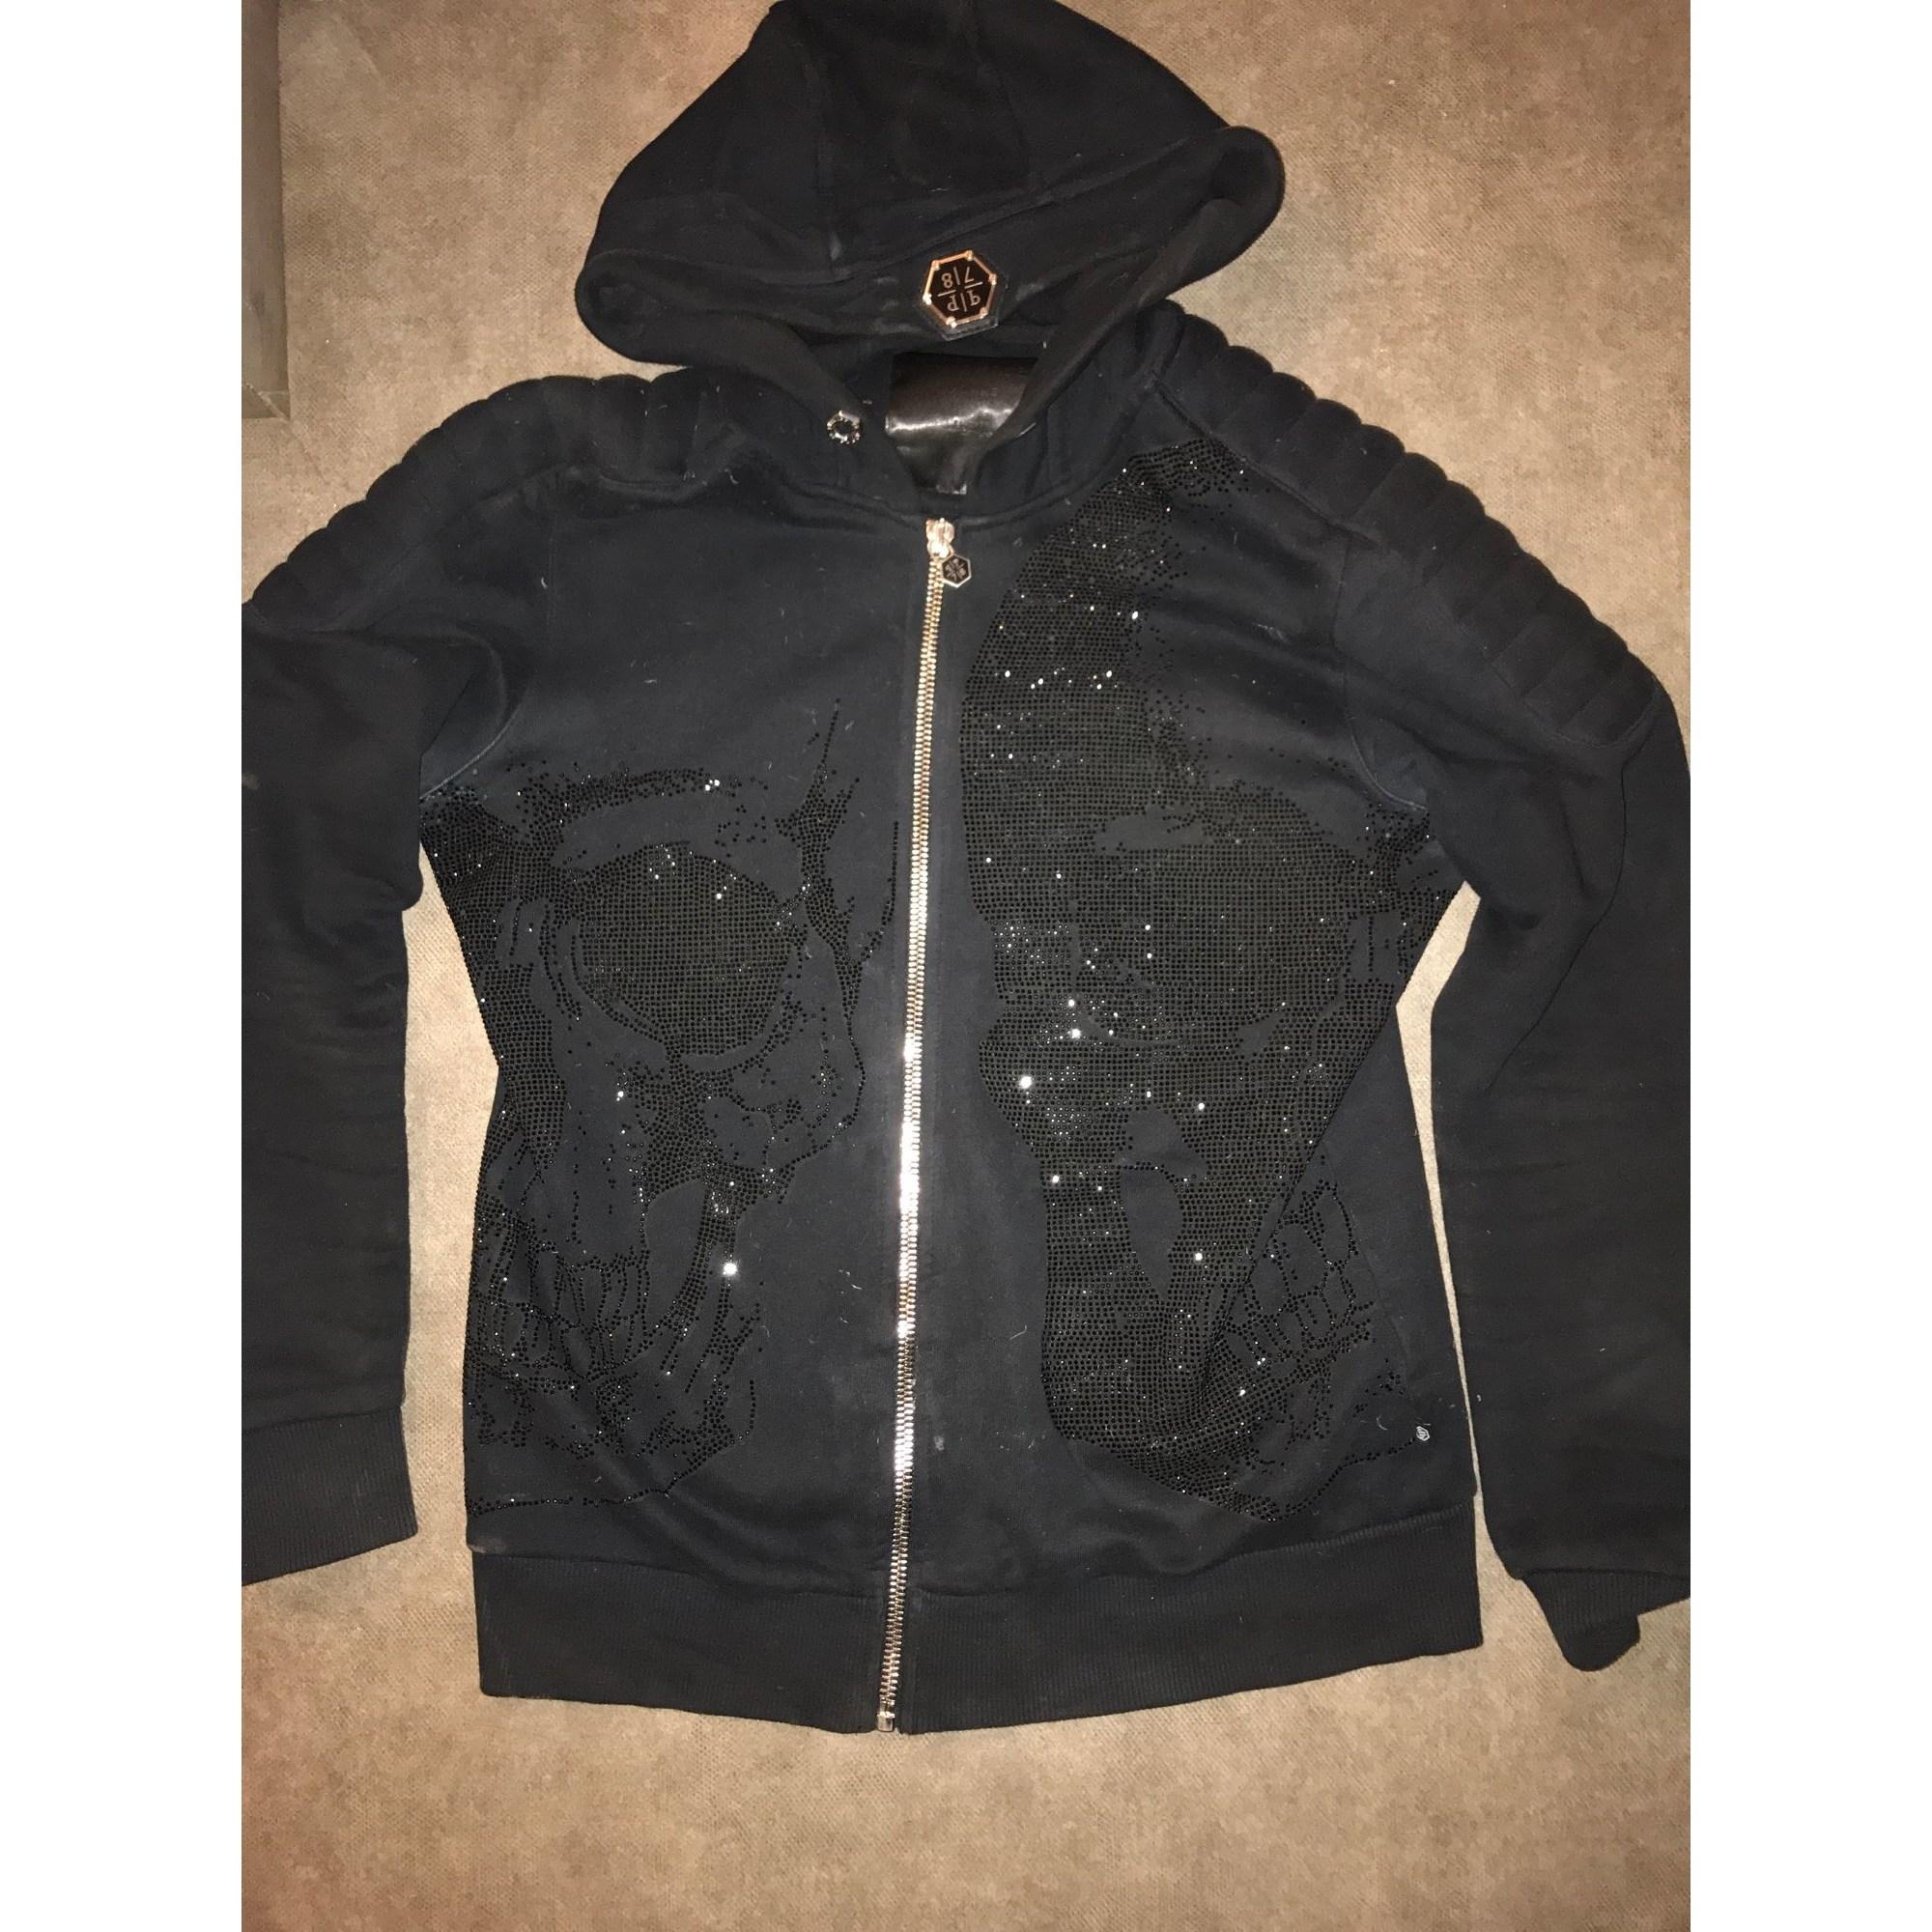 Veste PHILIPP PLEIN 58 (XL) noir - 571279